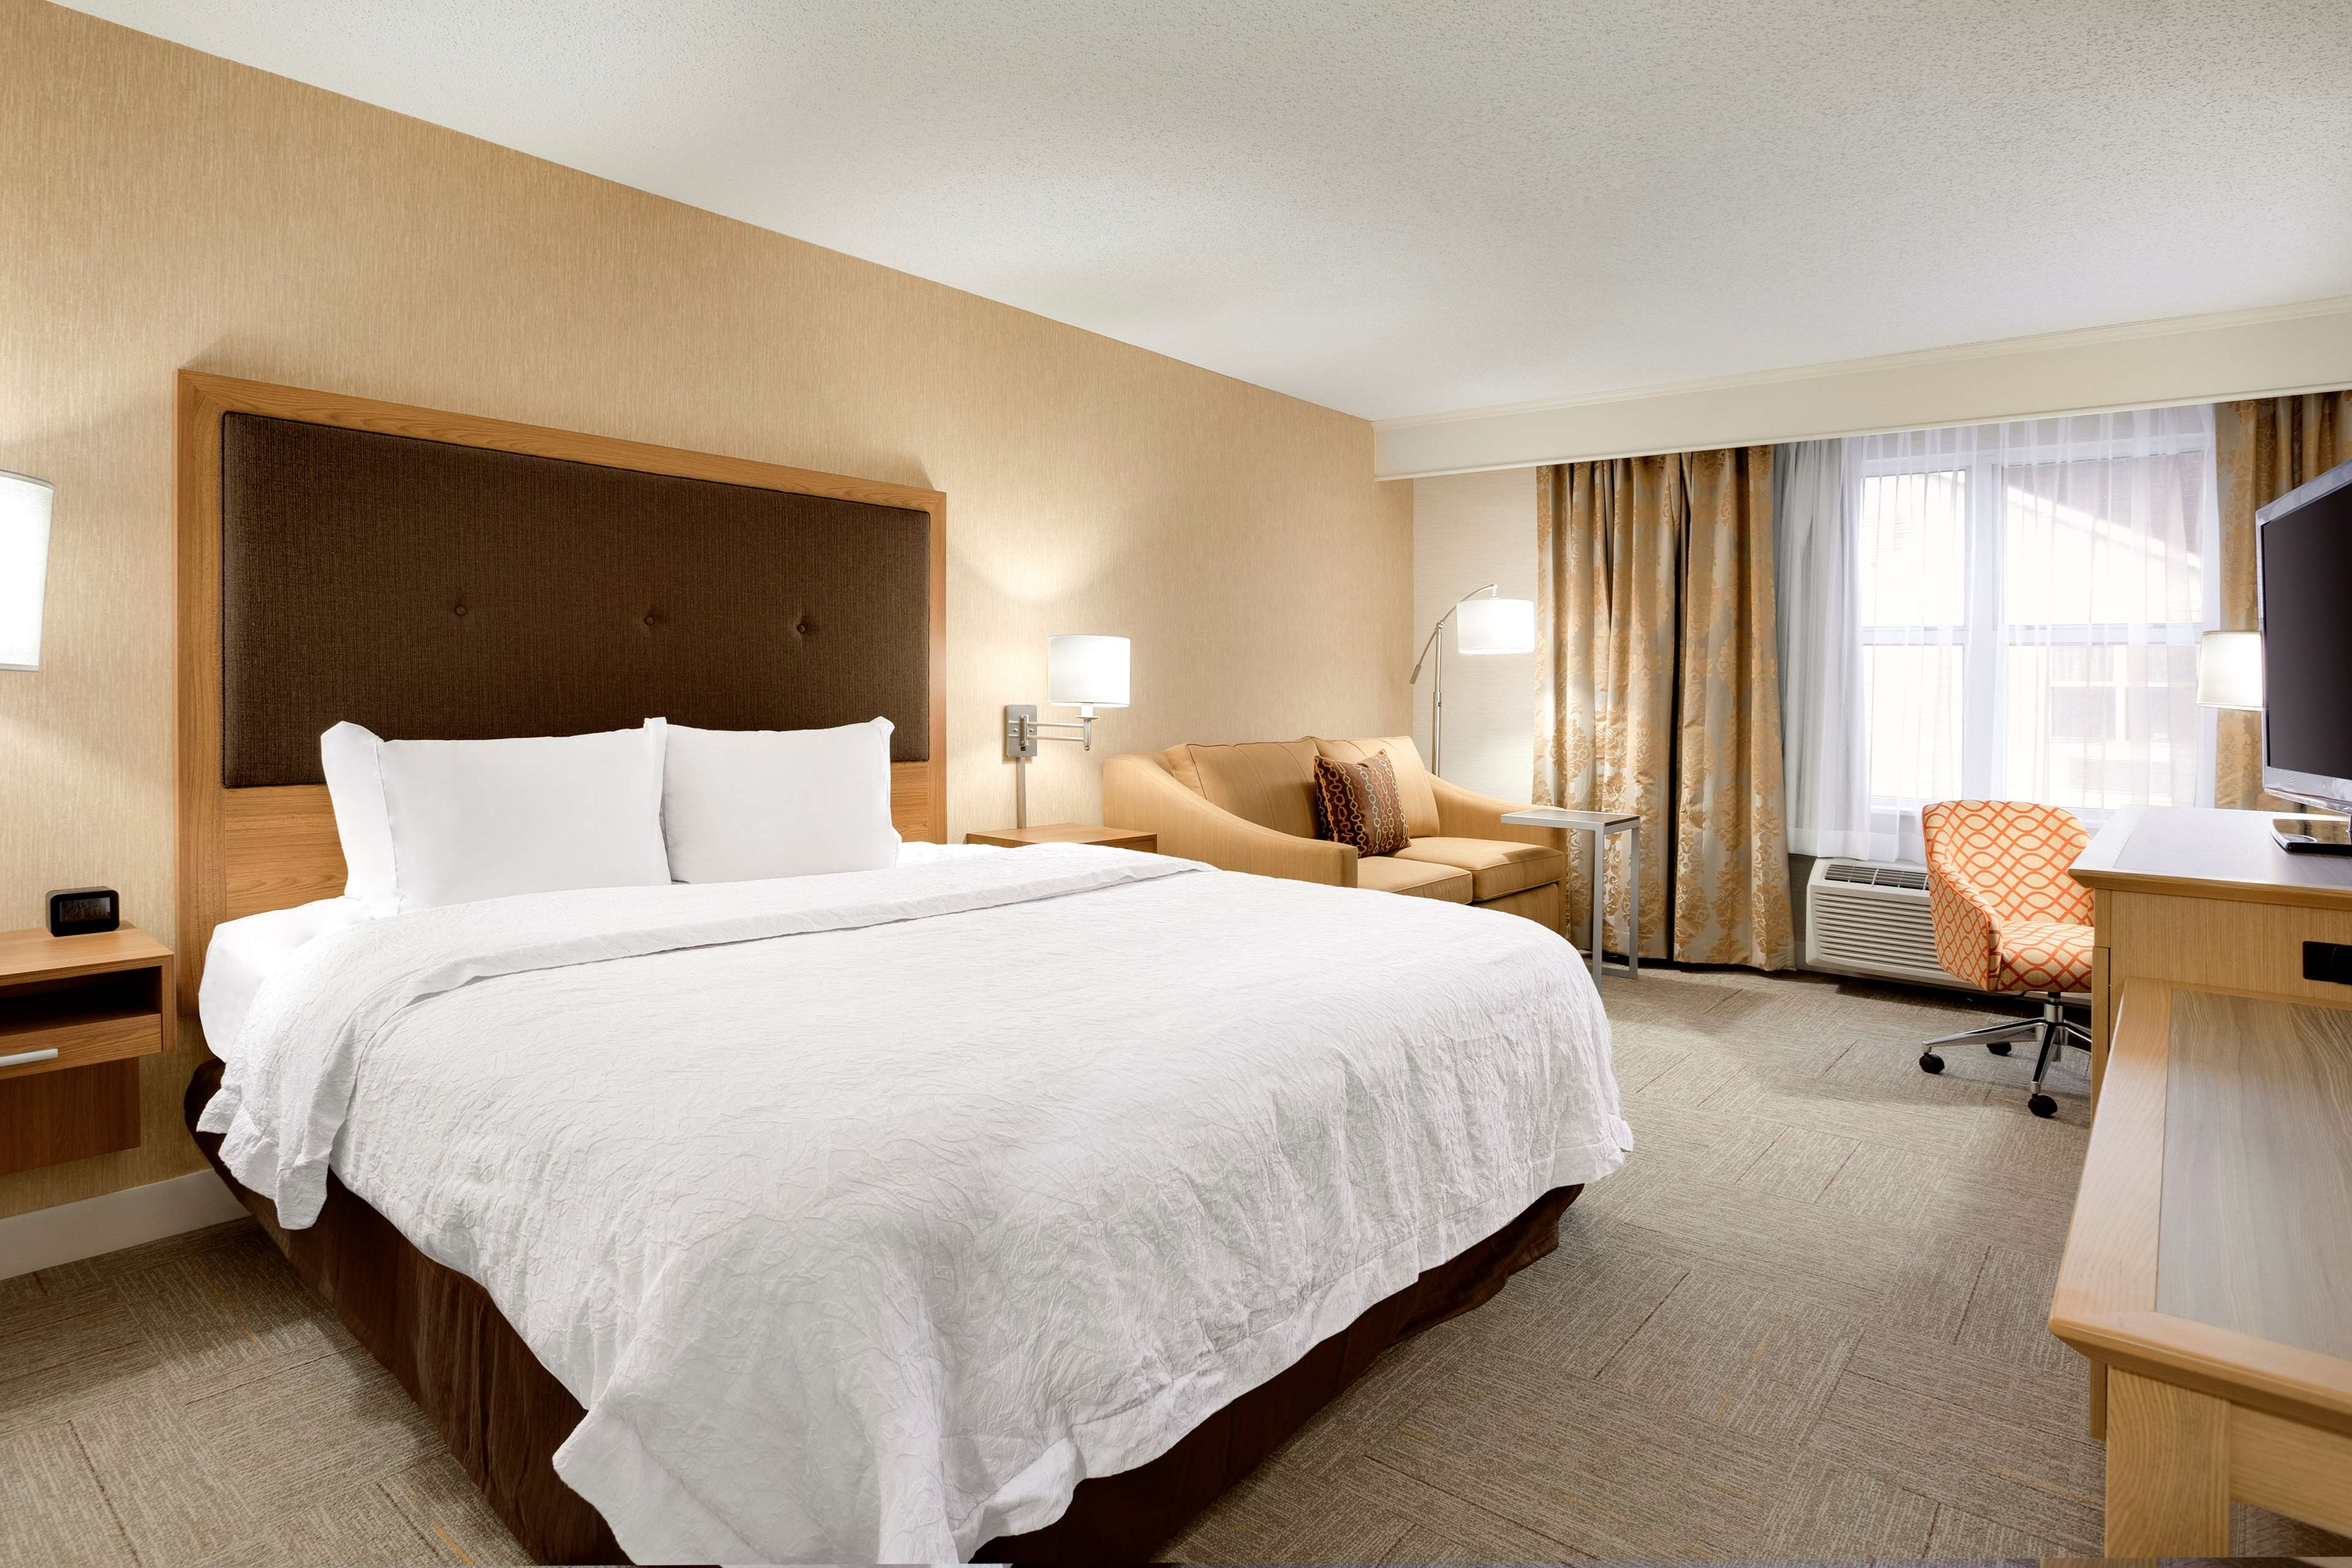 Hampton Inn & Suites Cleveland/Independence image 12